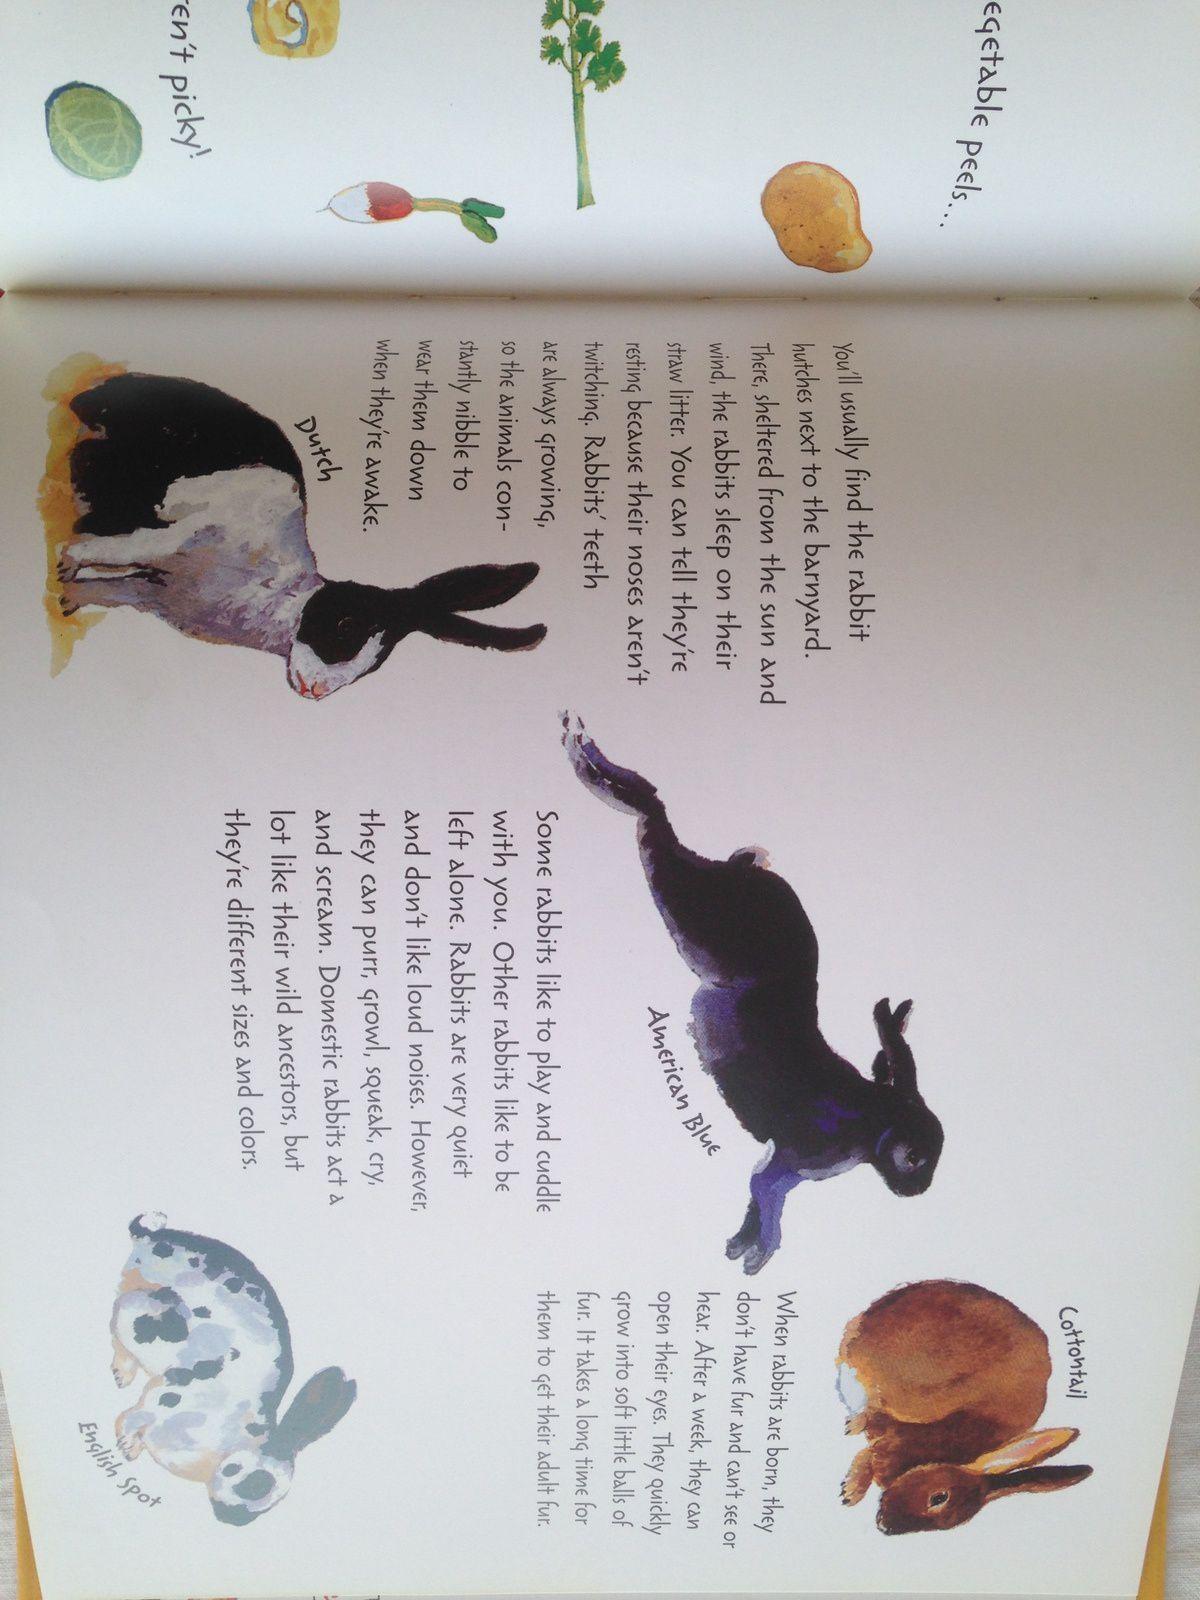 #Animal on the #farm english book , sonia goldie, pascalle estellon anne weiss #charlotteblabla blog